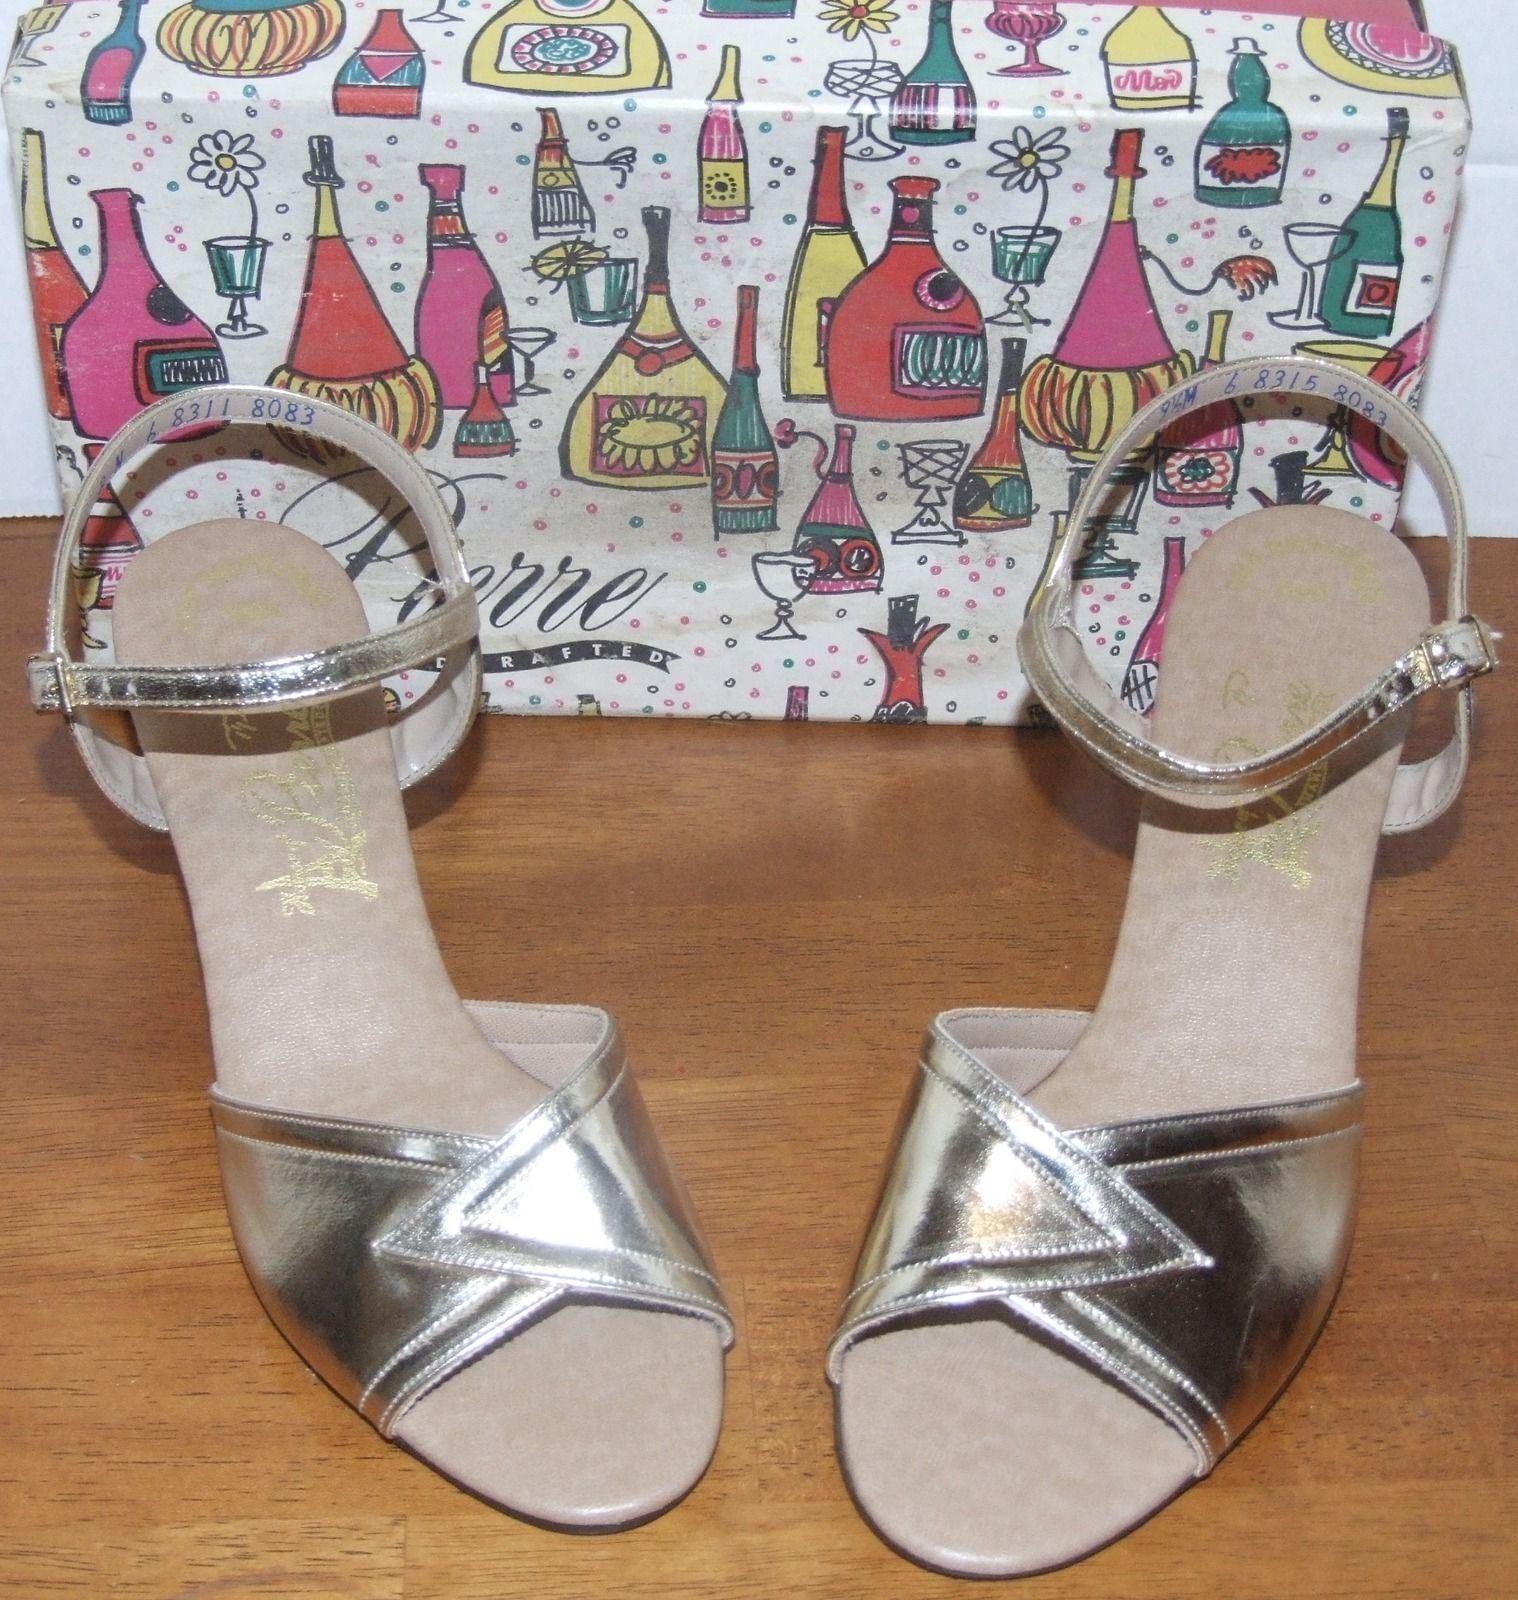 House Toe of Pierre Gold Open Toe House Heeled Shoe 9 ½ M 54956e